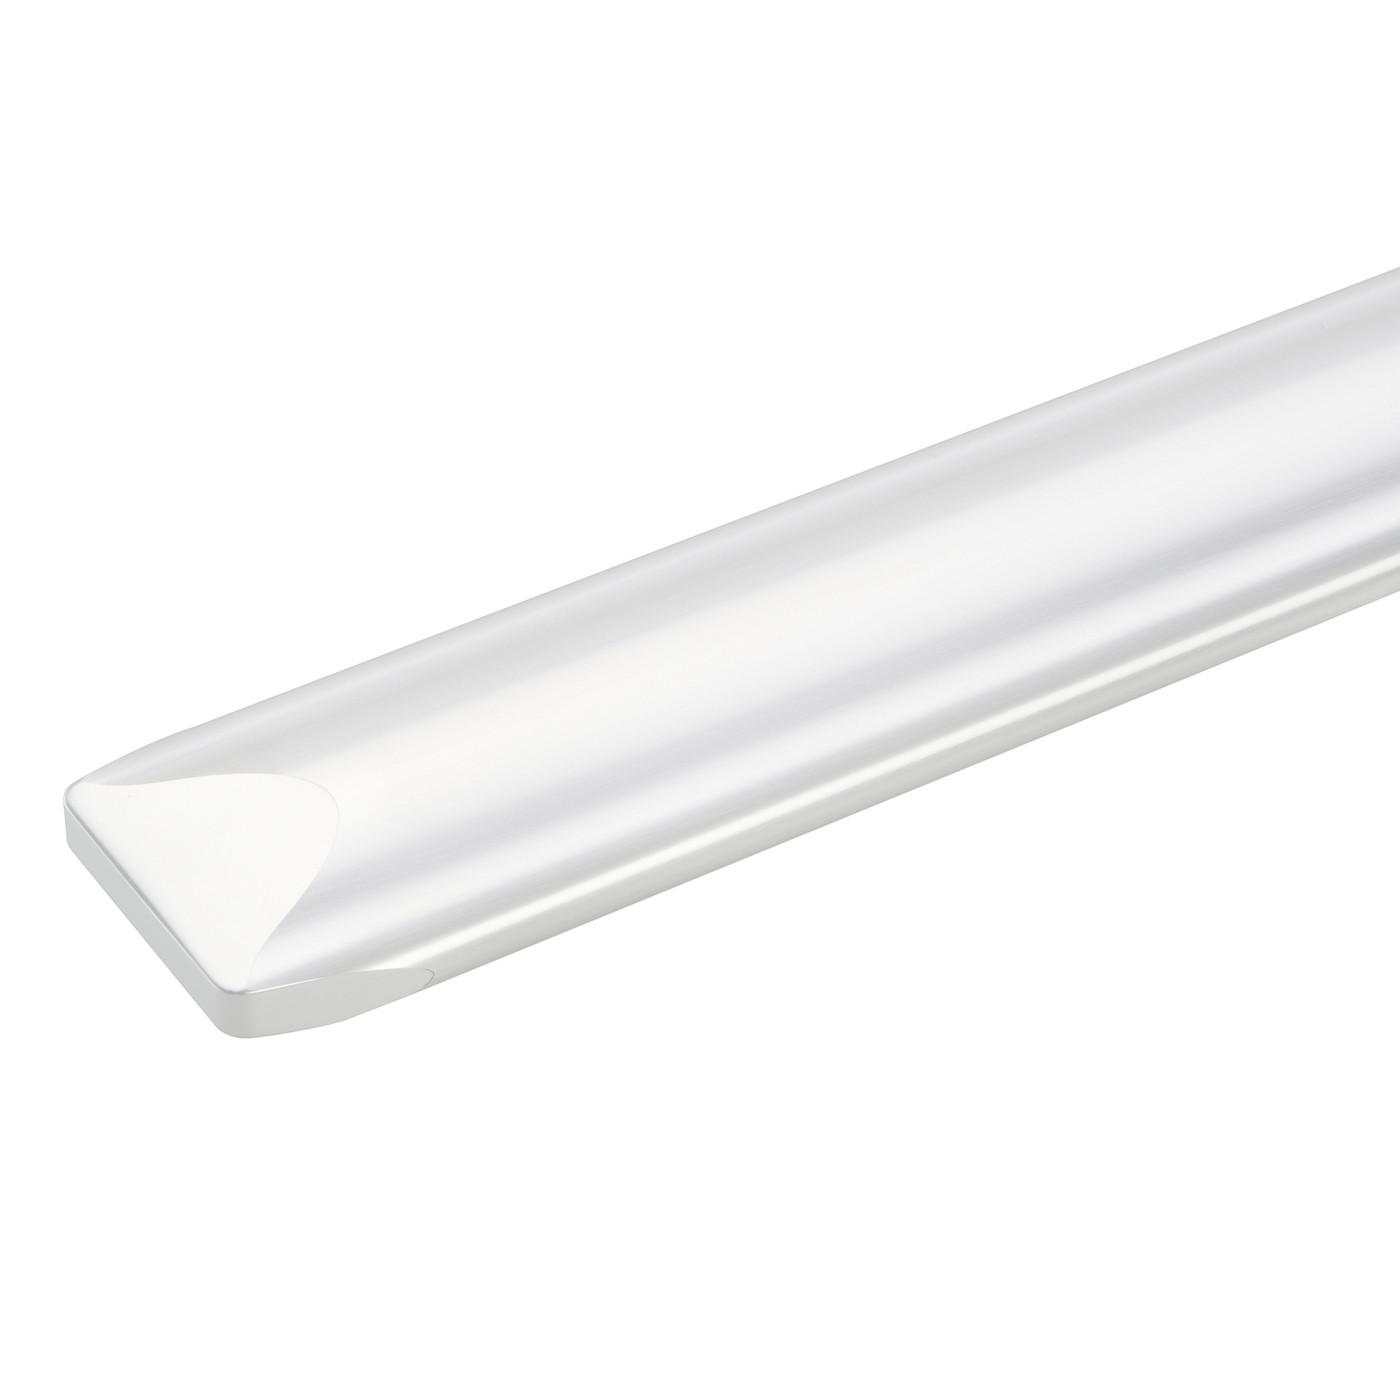 Liin Light Innovations Anax 102 Pendelleuchte